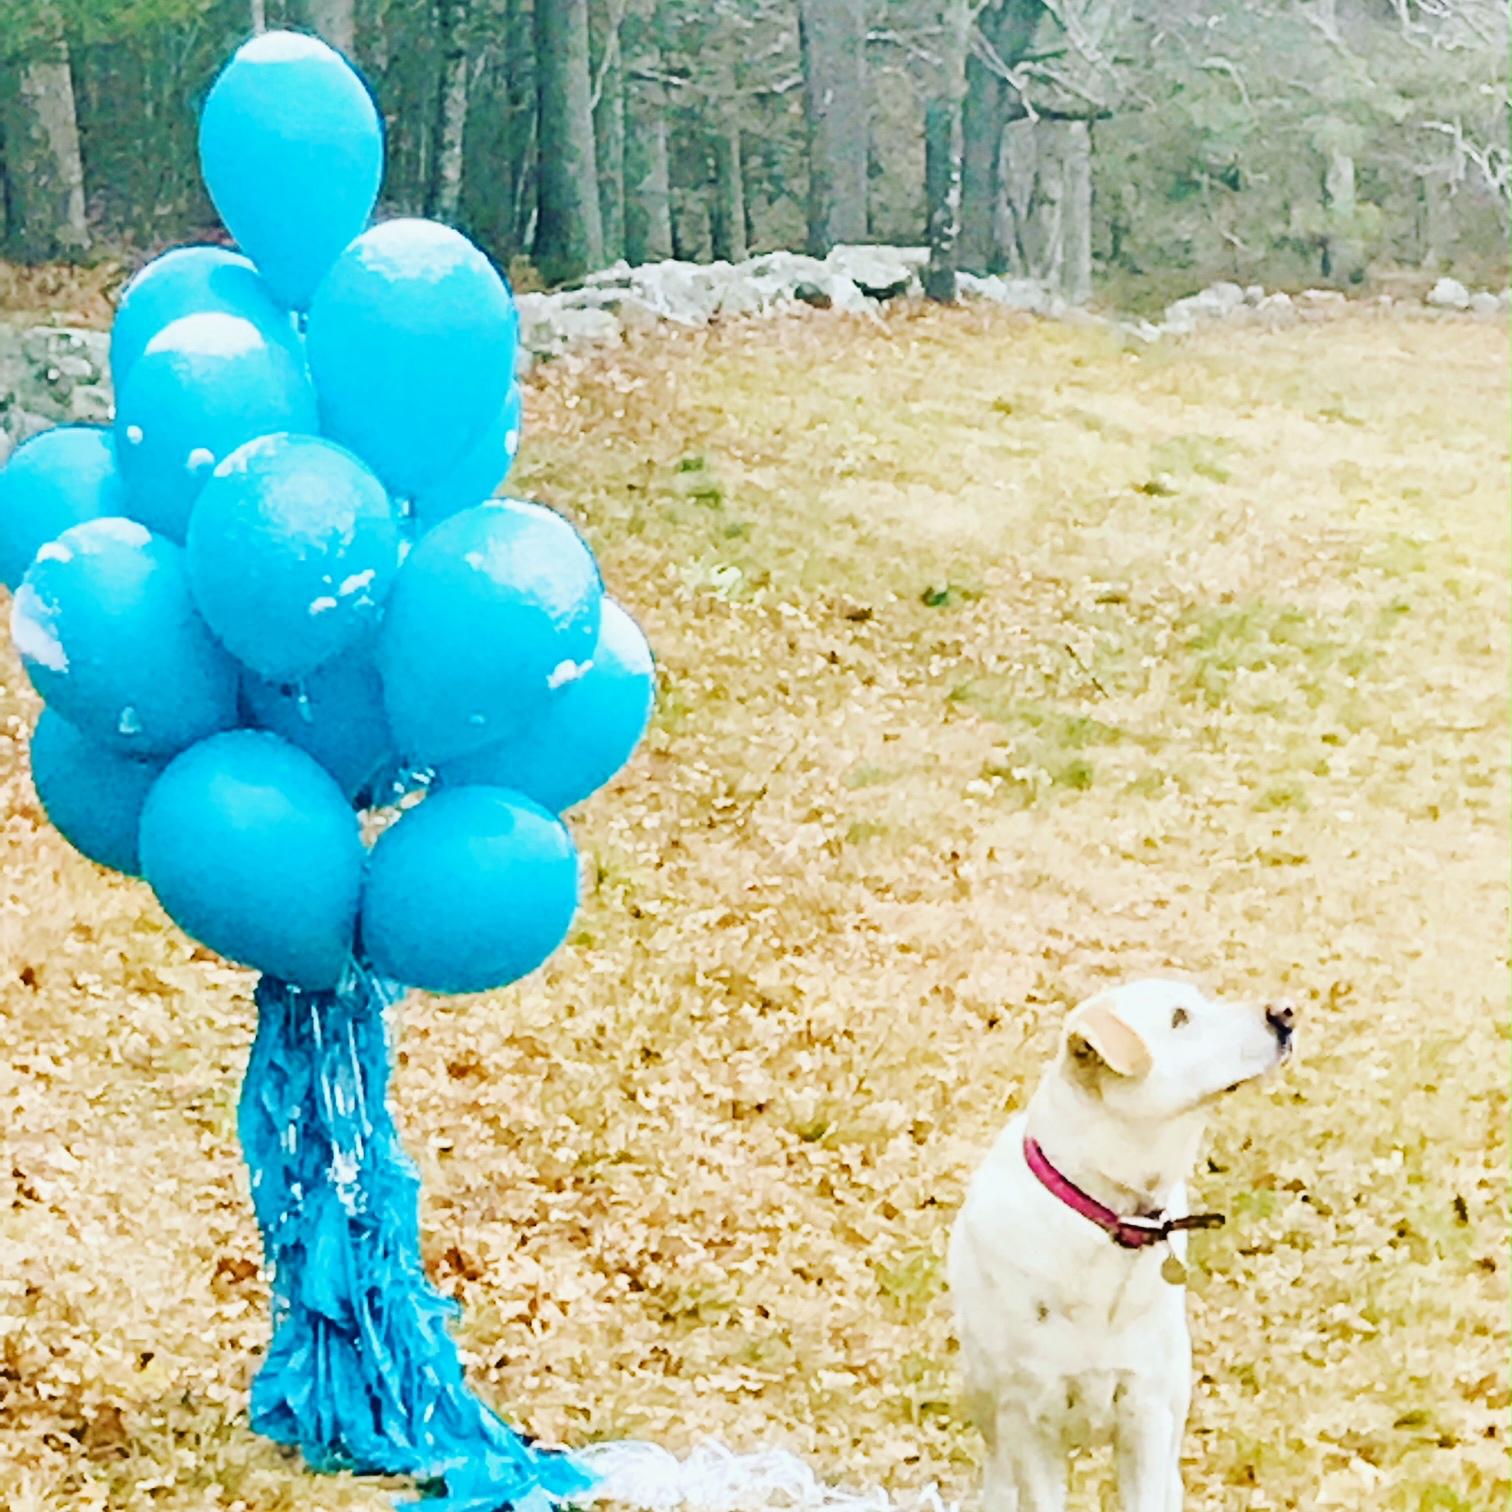 Suzi wonders who sent the balloons